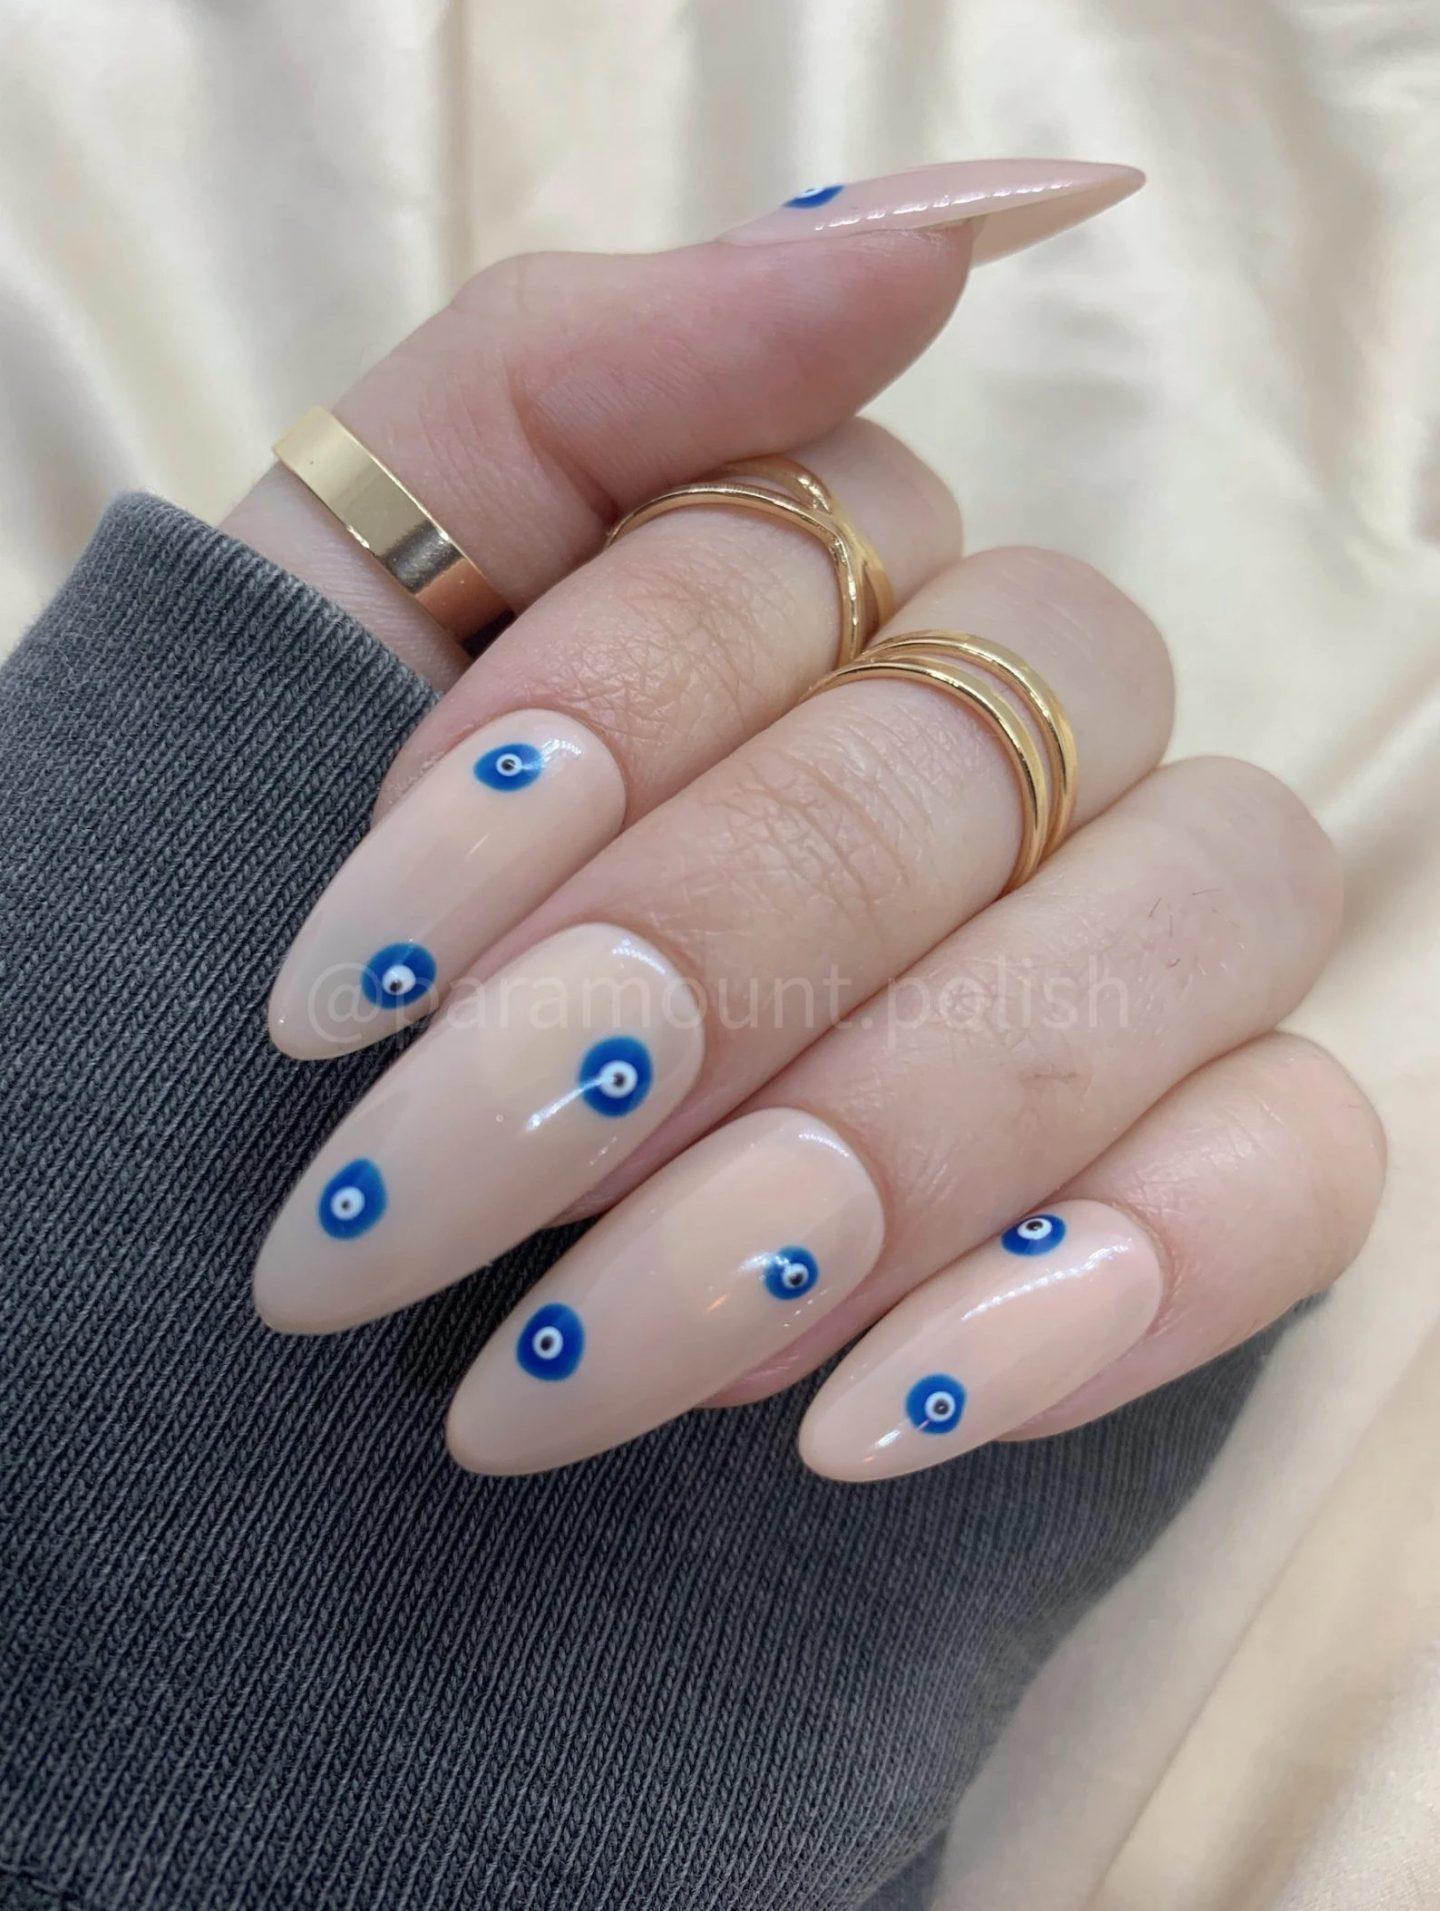 Minimalist neutral evil eye nails in almond shape